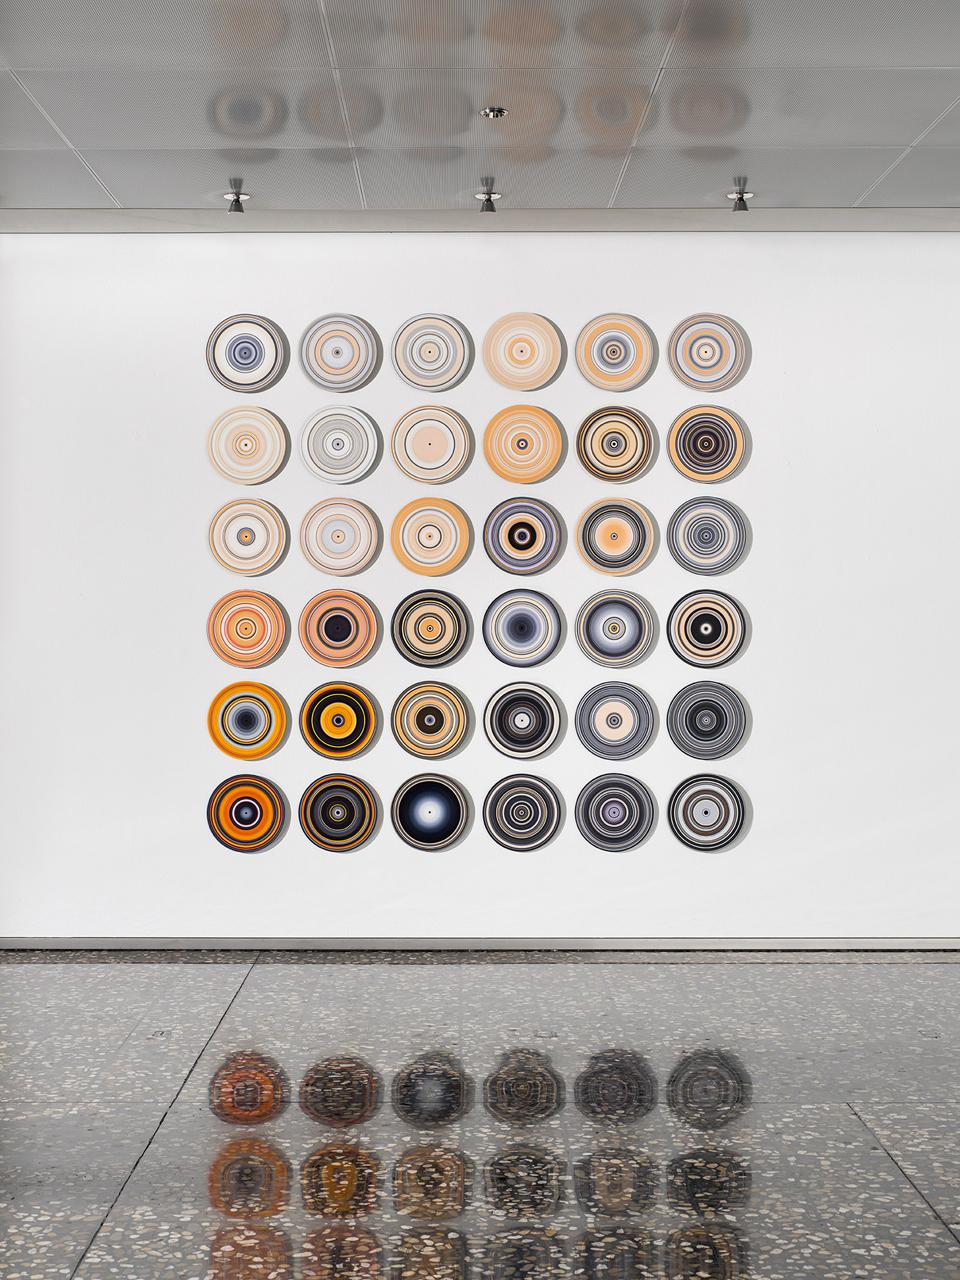 SOUND AND VISION, BlackWhiteOrange, 2020, Oil on Vinyl, 36 pieces, each Ø 30cm, Foto: Roman Mensing